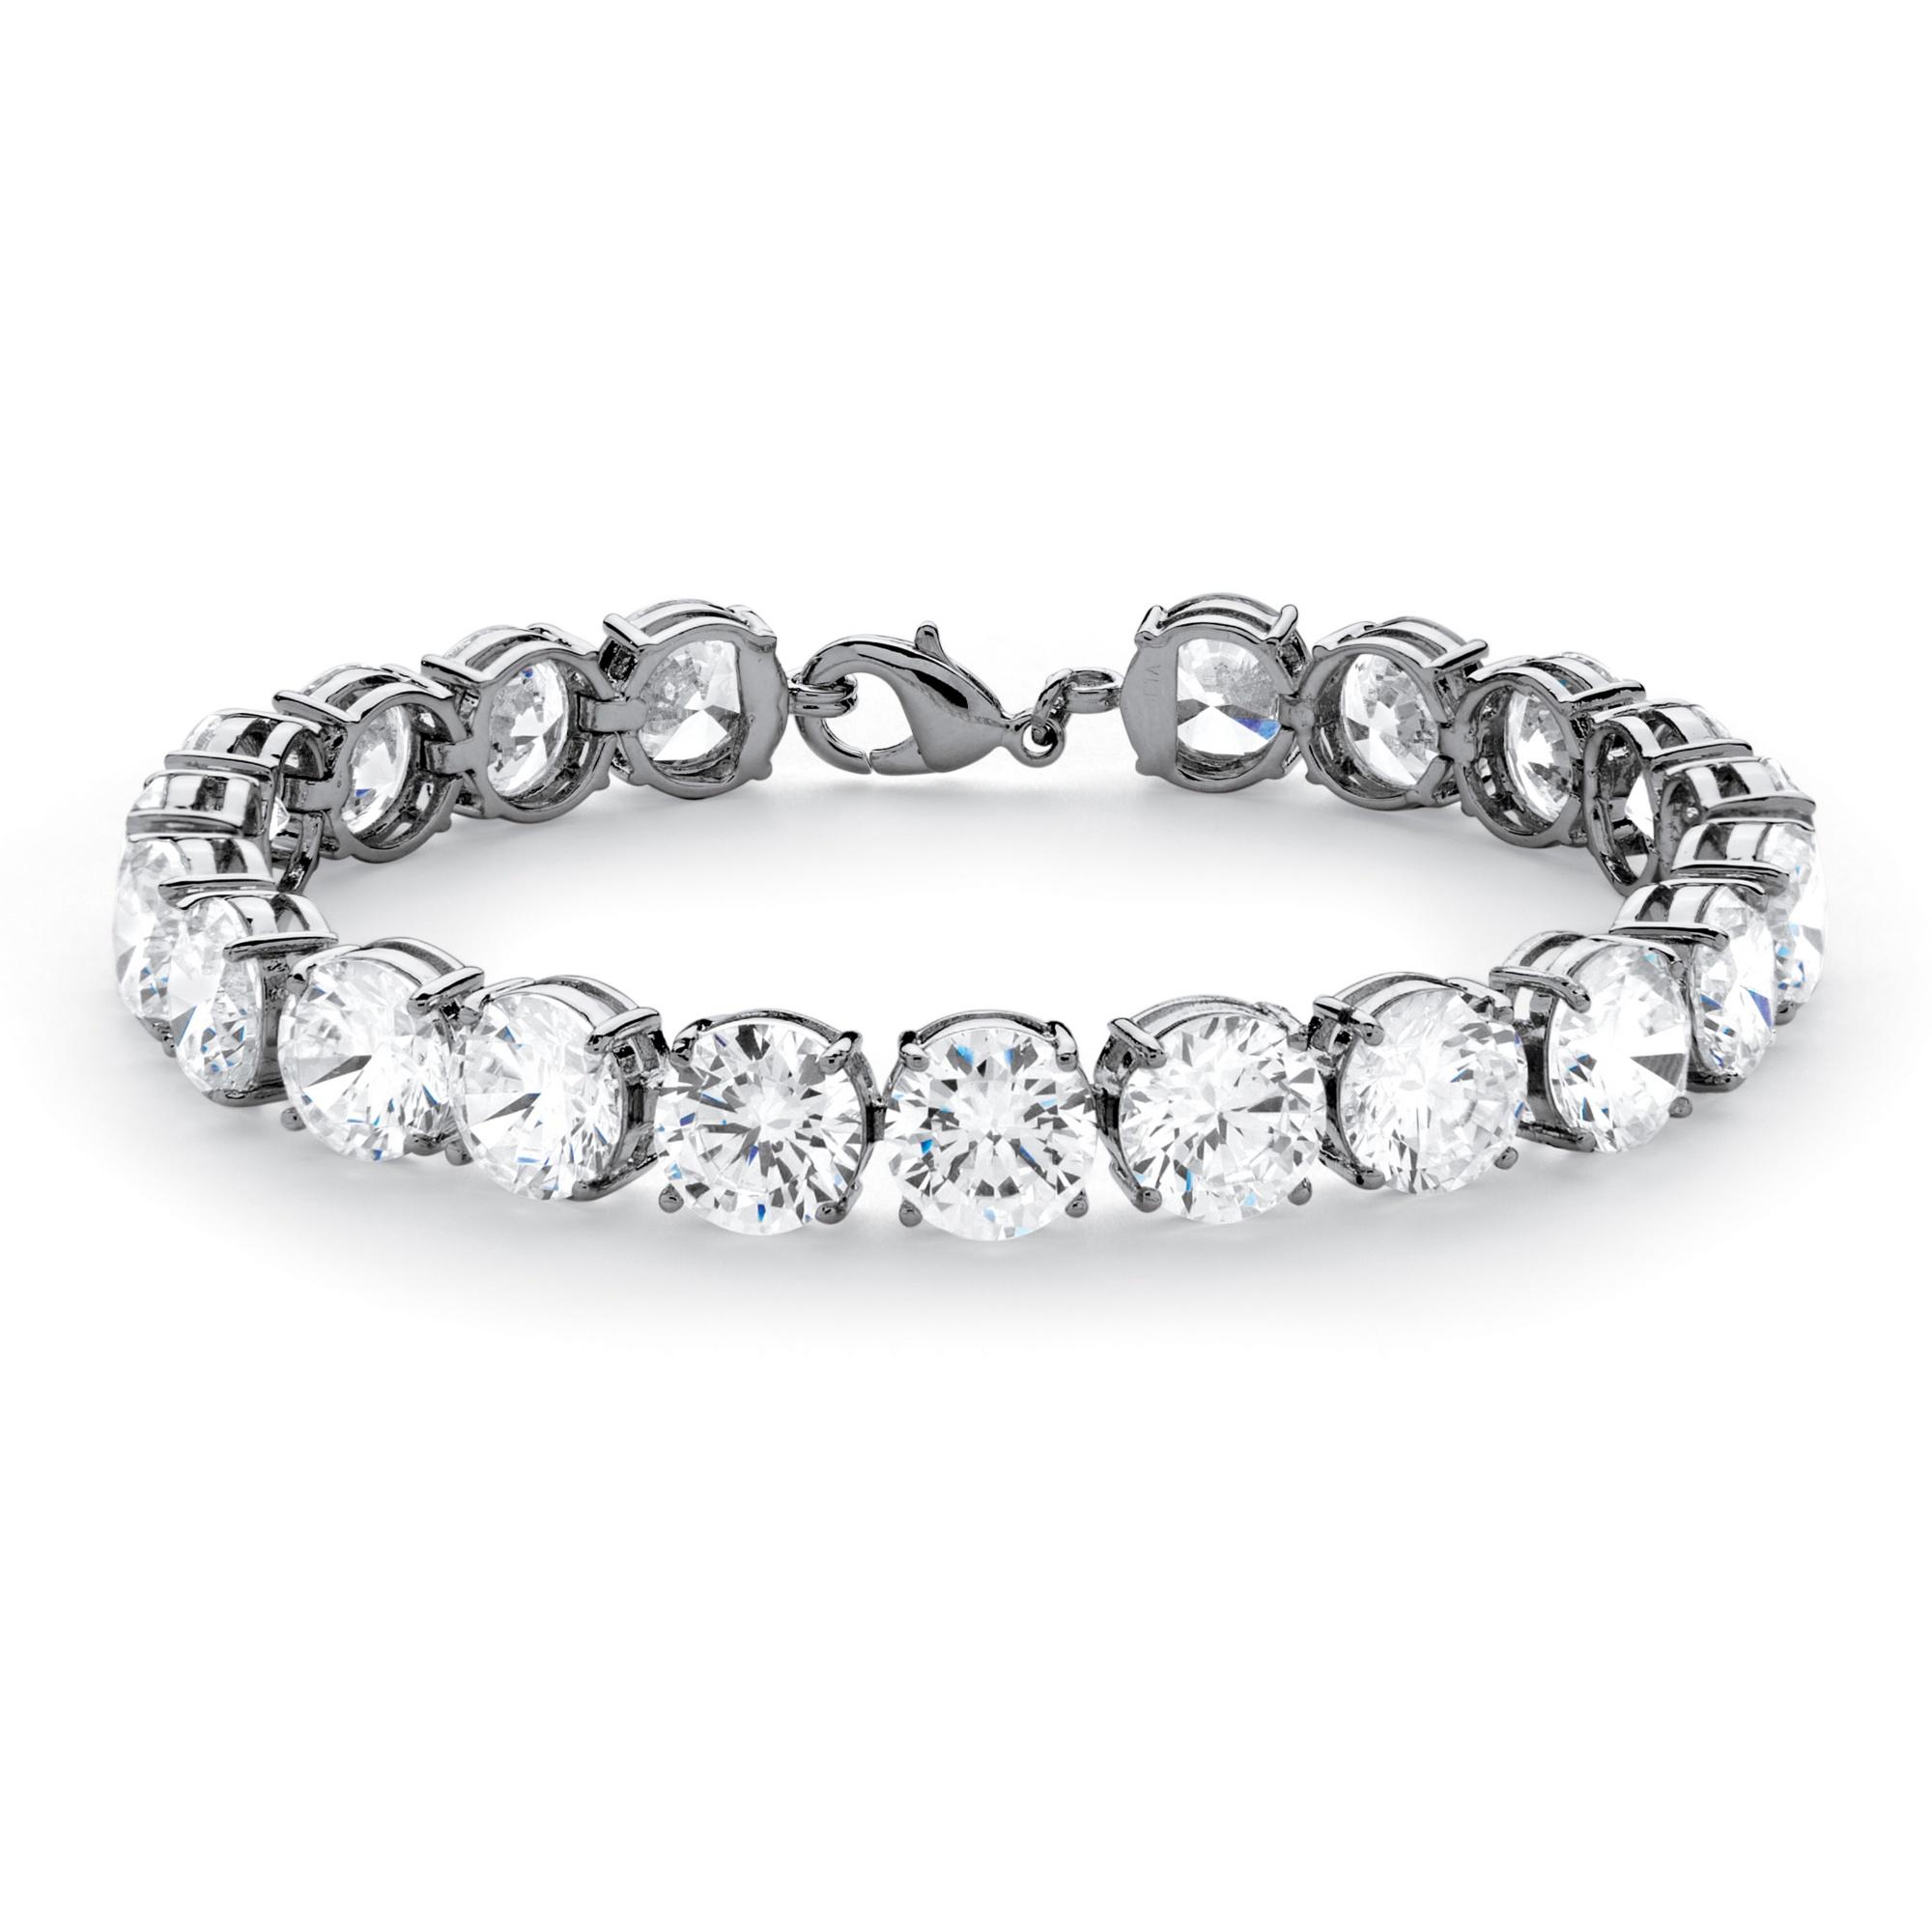 "42.00 TCW Round Cubic Zirconia Platinum Plated Tennis Bracelet 7 1/4"" at PalmBeach Jewelry"